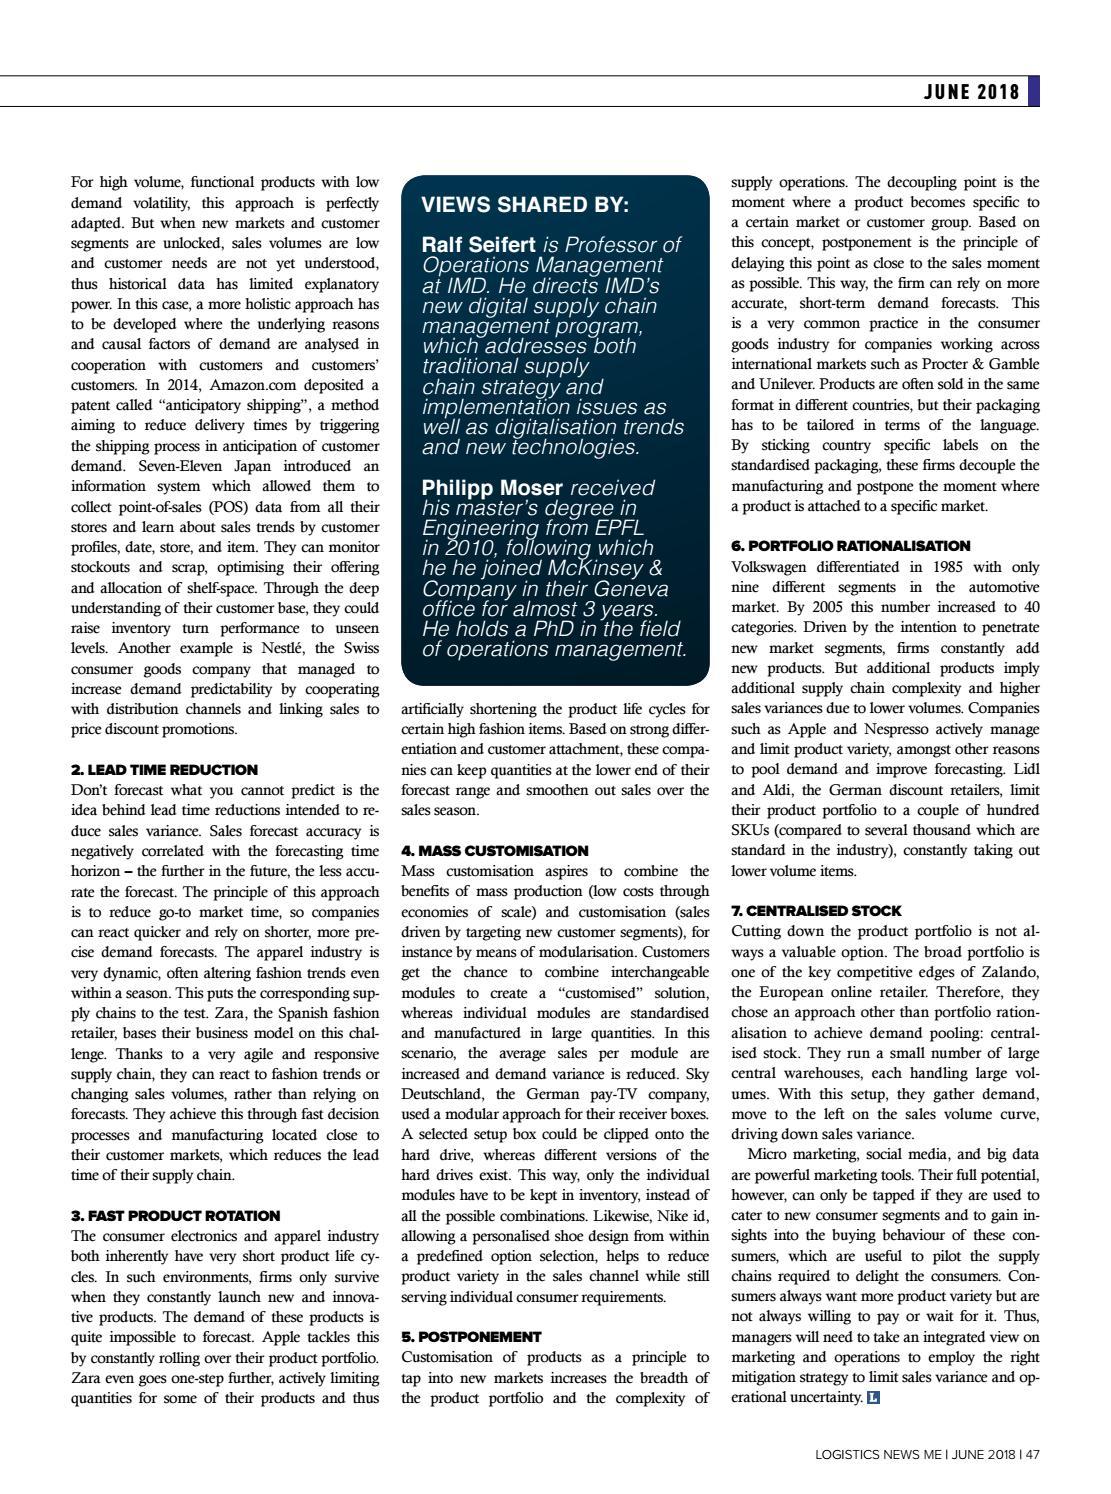 Logistics News ME - June 2018 by BNC Publishing - issuu